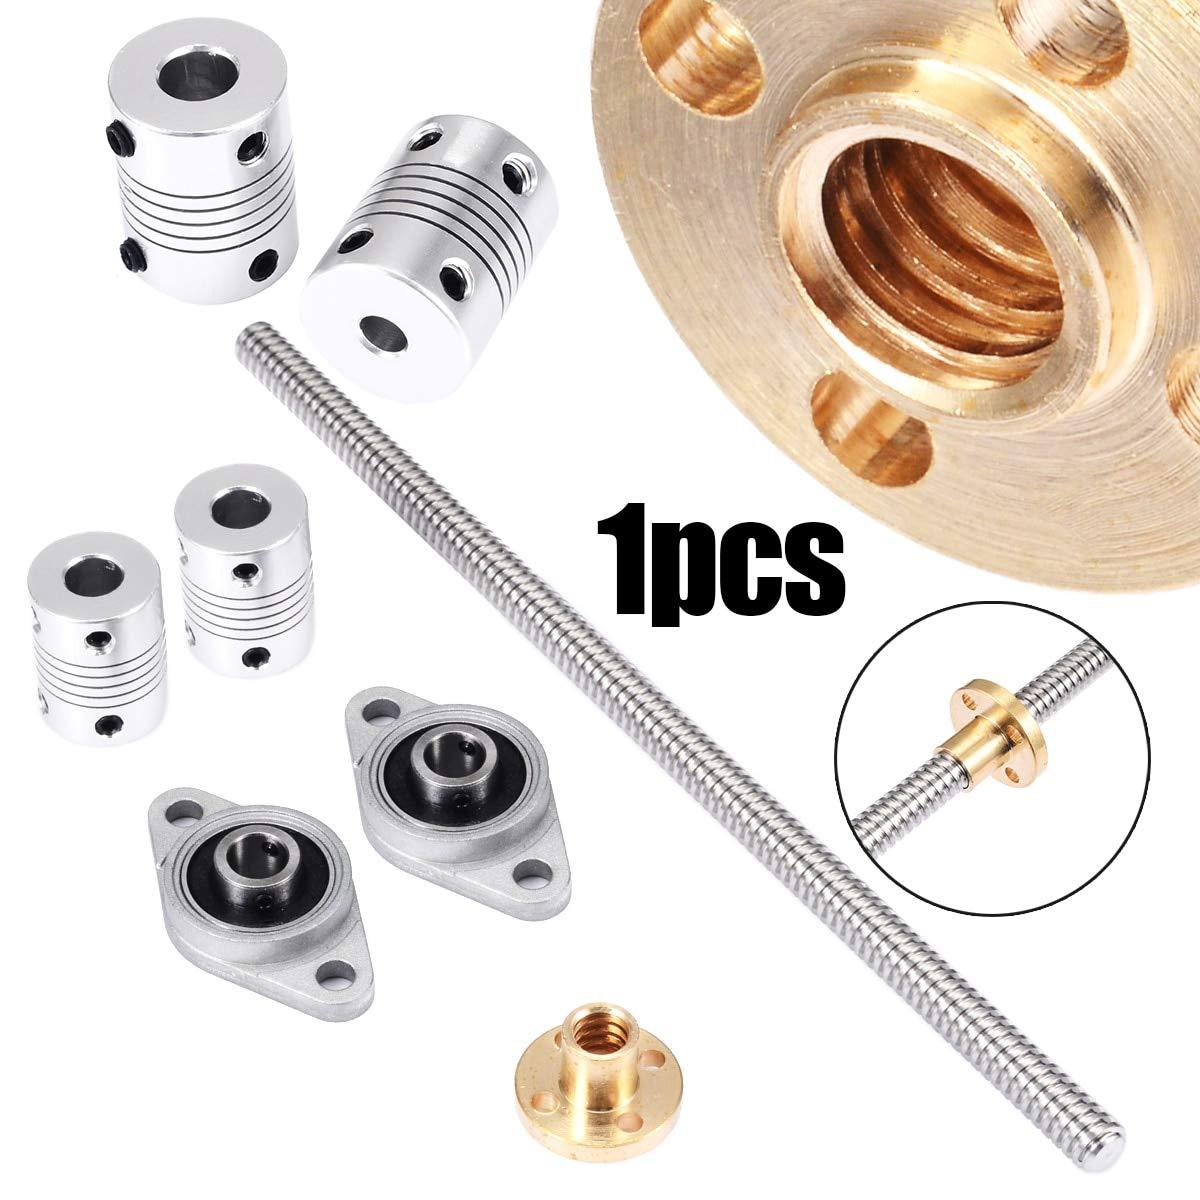 Ochoos 1pc T8 2mm Lead Screw Rod CNC Linear Rail Bar Shaft+2pcs Coupling+2pcs Pillow Block Suited for Industrial Automation Equipment